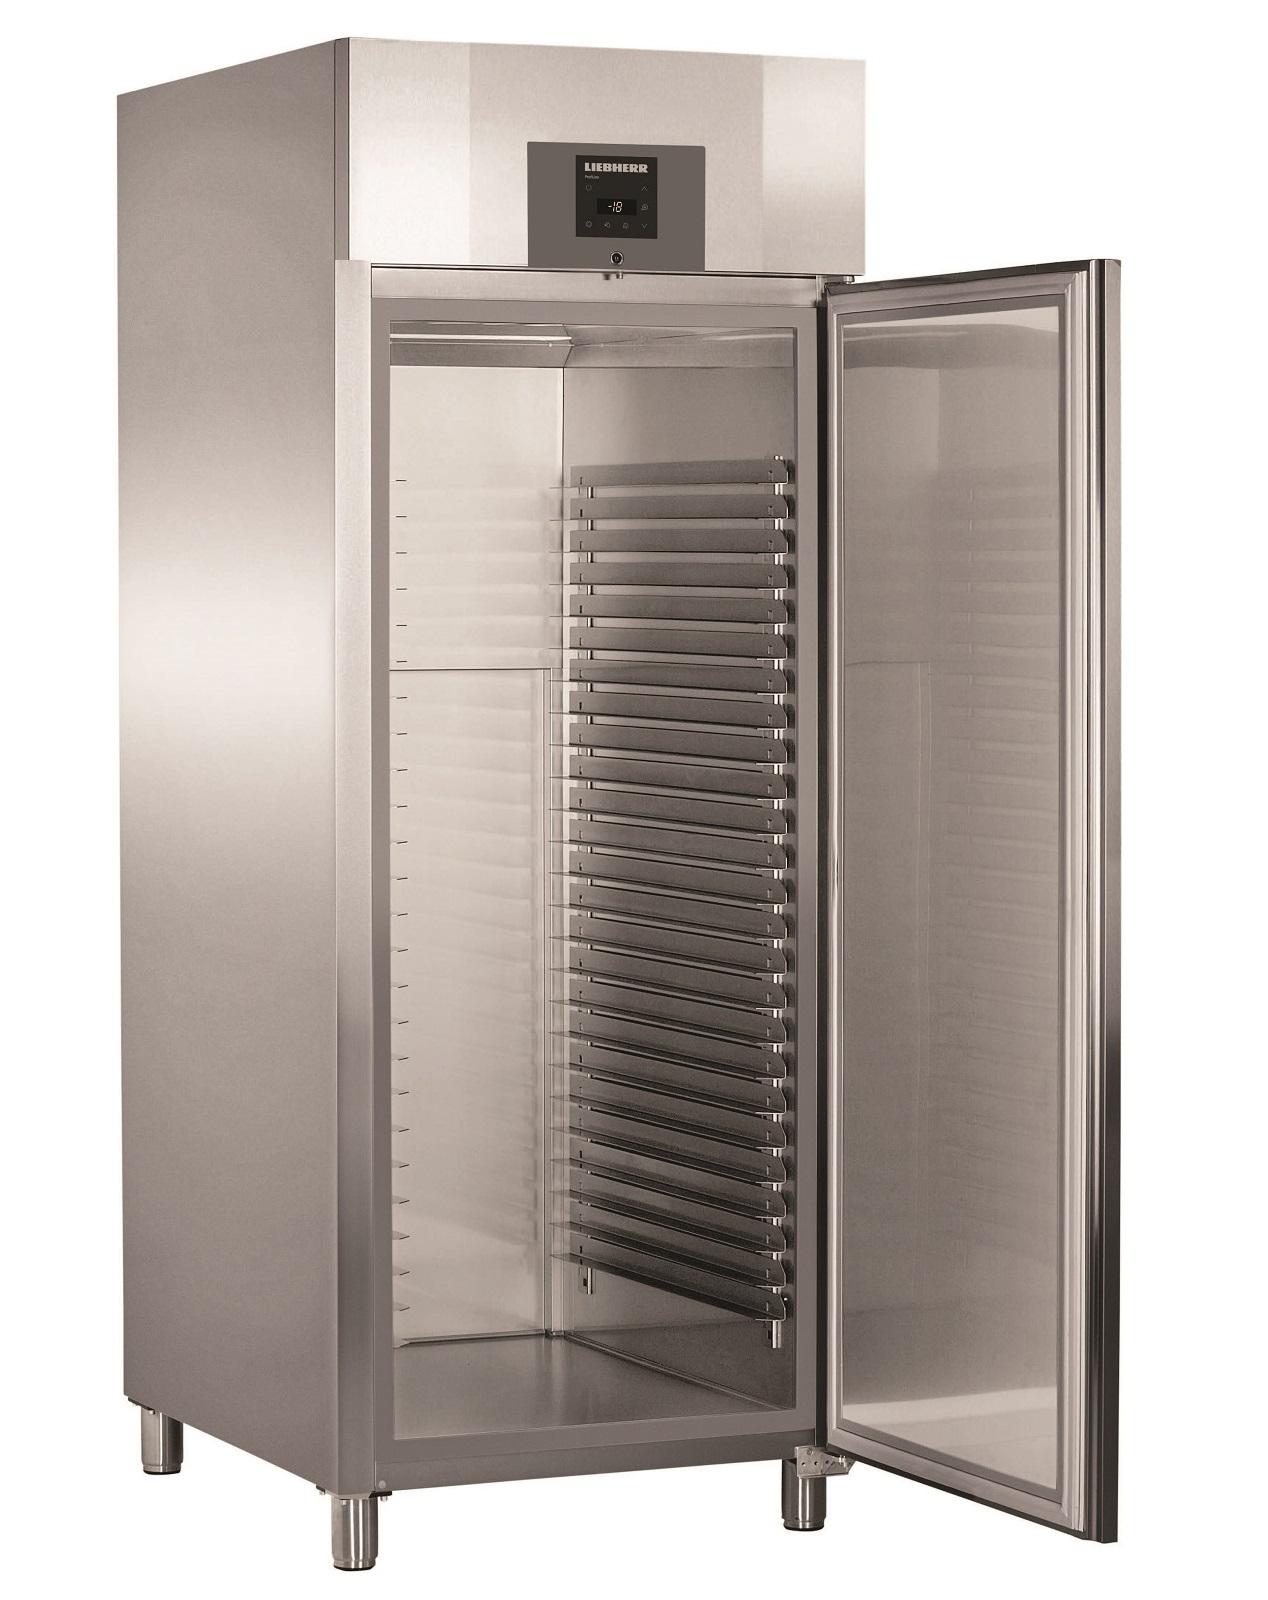 Морозильный шкаф Liebherr BGPv 8470 купить украина